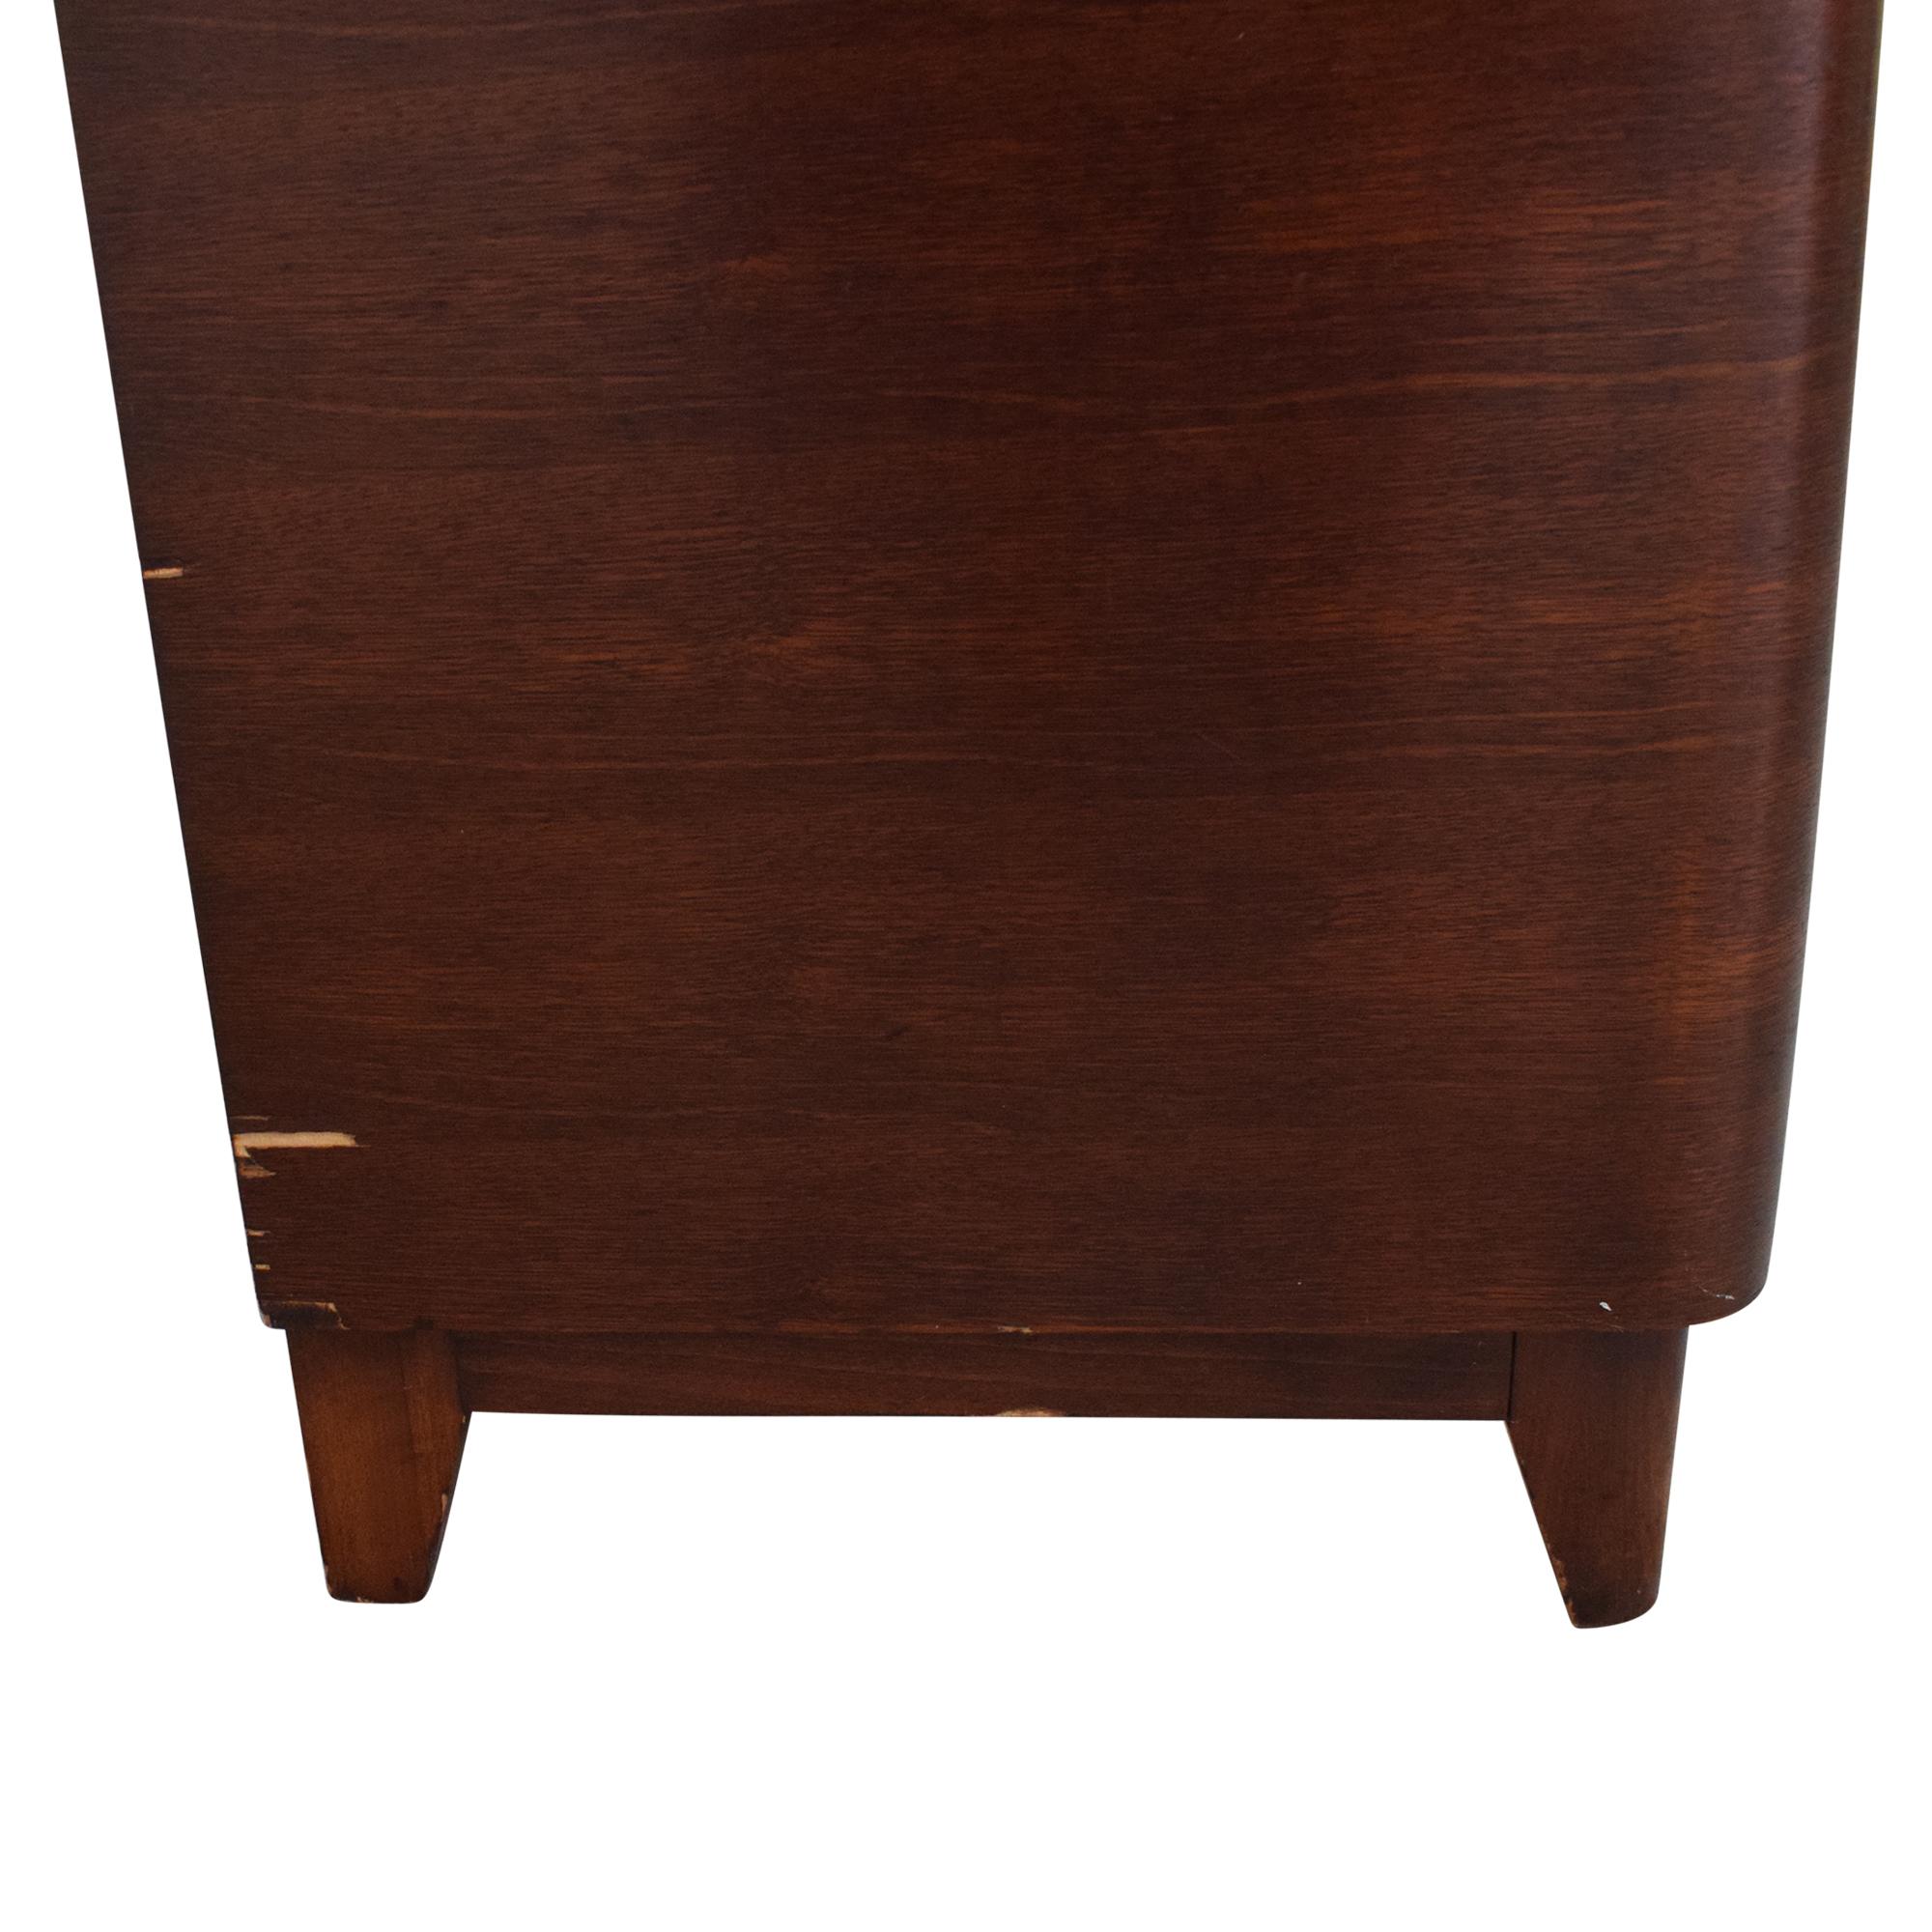 Vintage Mid Century Cabinet Nightstand Tables